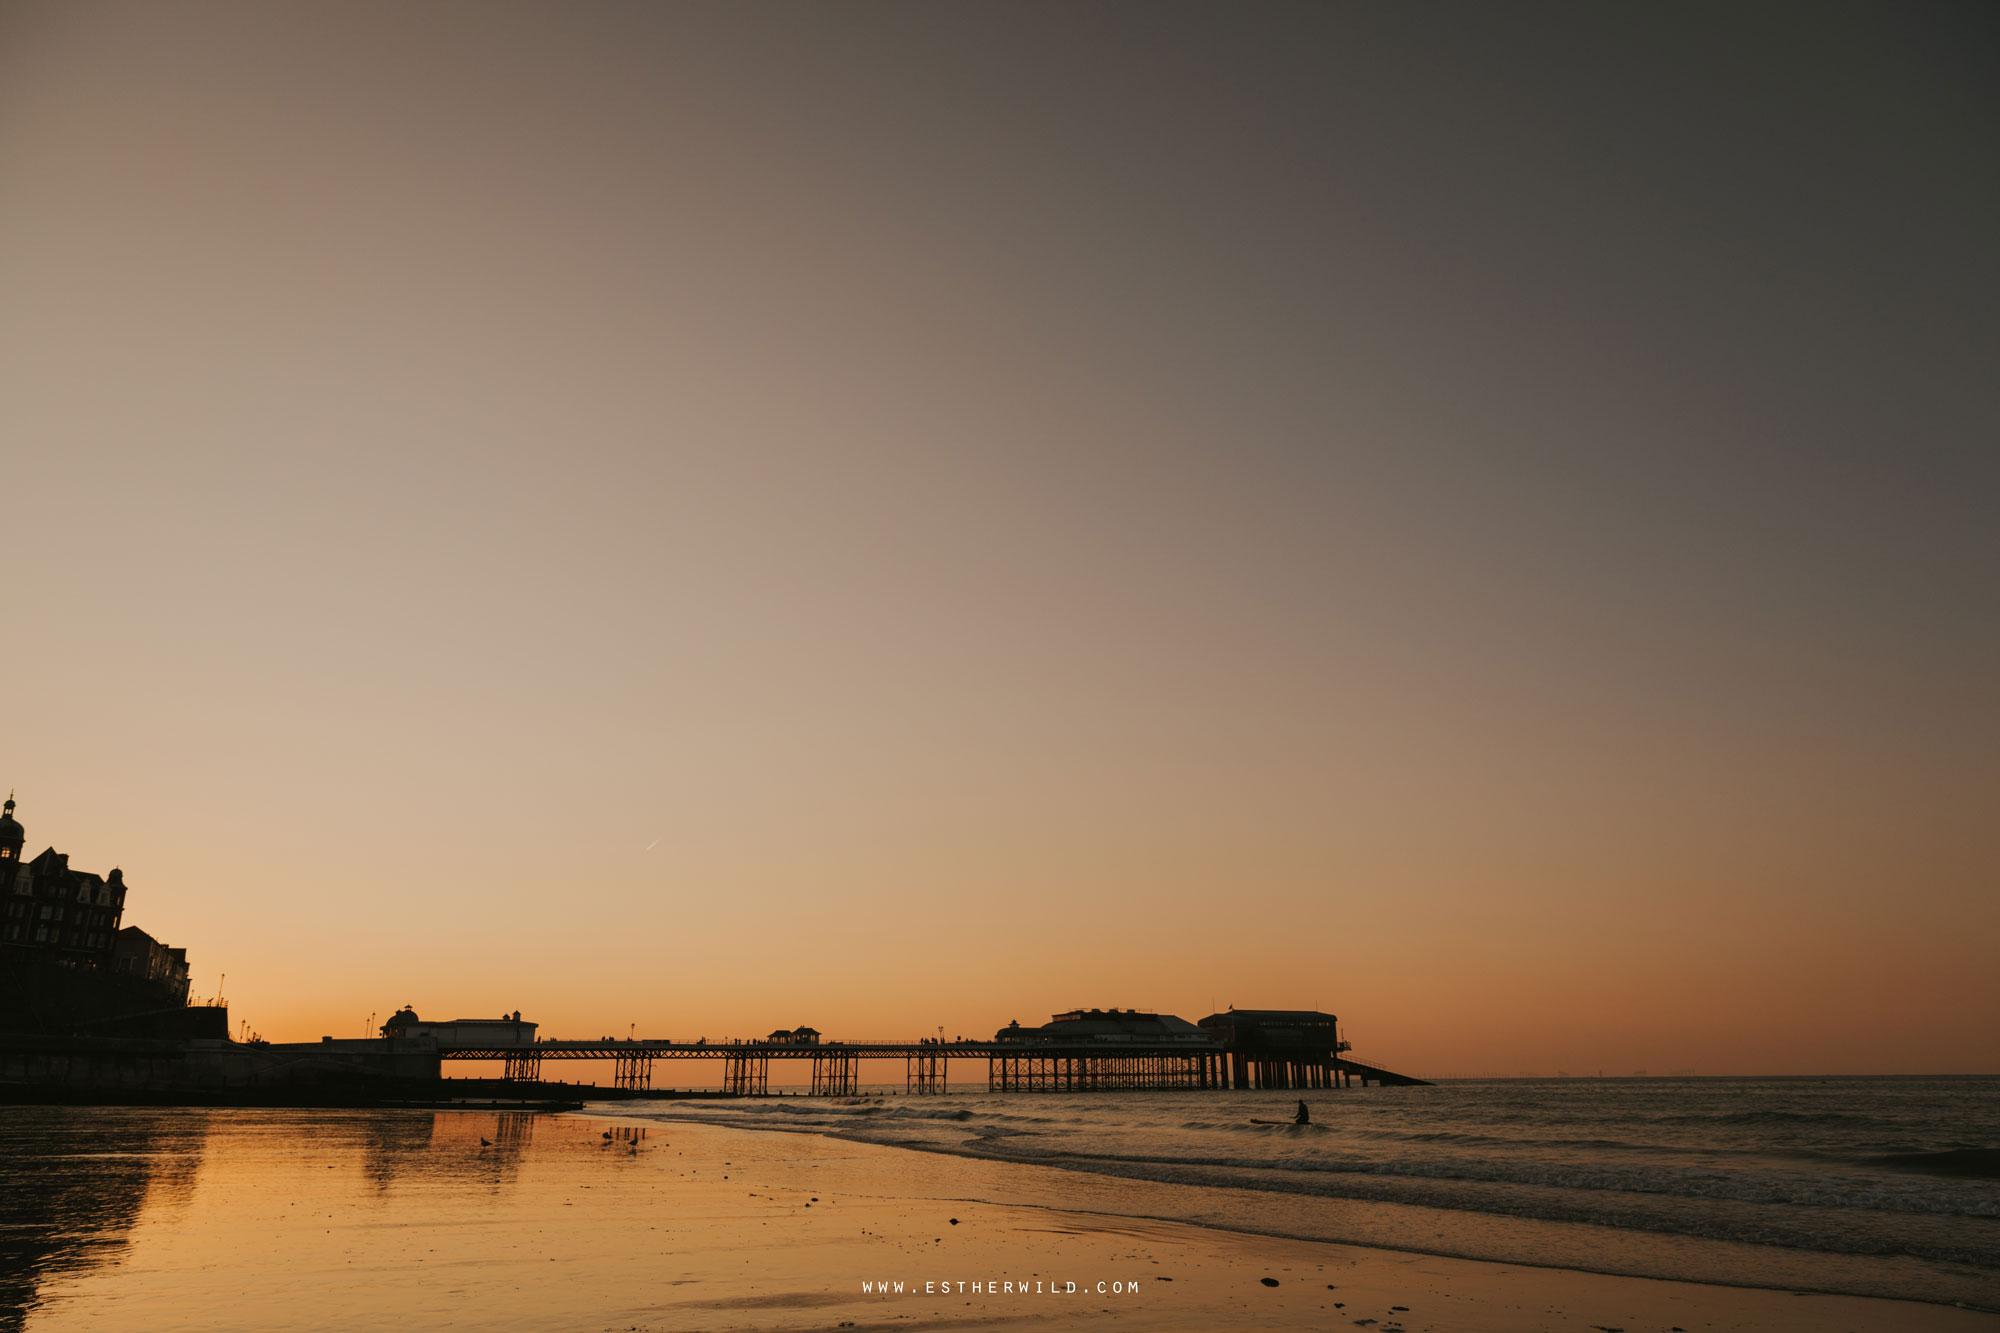 Cromer_Wedding_Beach_Outdoor_Ceremony_Norfolk_North_Lodge_Registry_Office_Rocket_House_Cafe_Cromer_Pier_IMG_5068.jpg